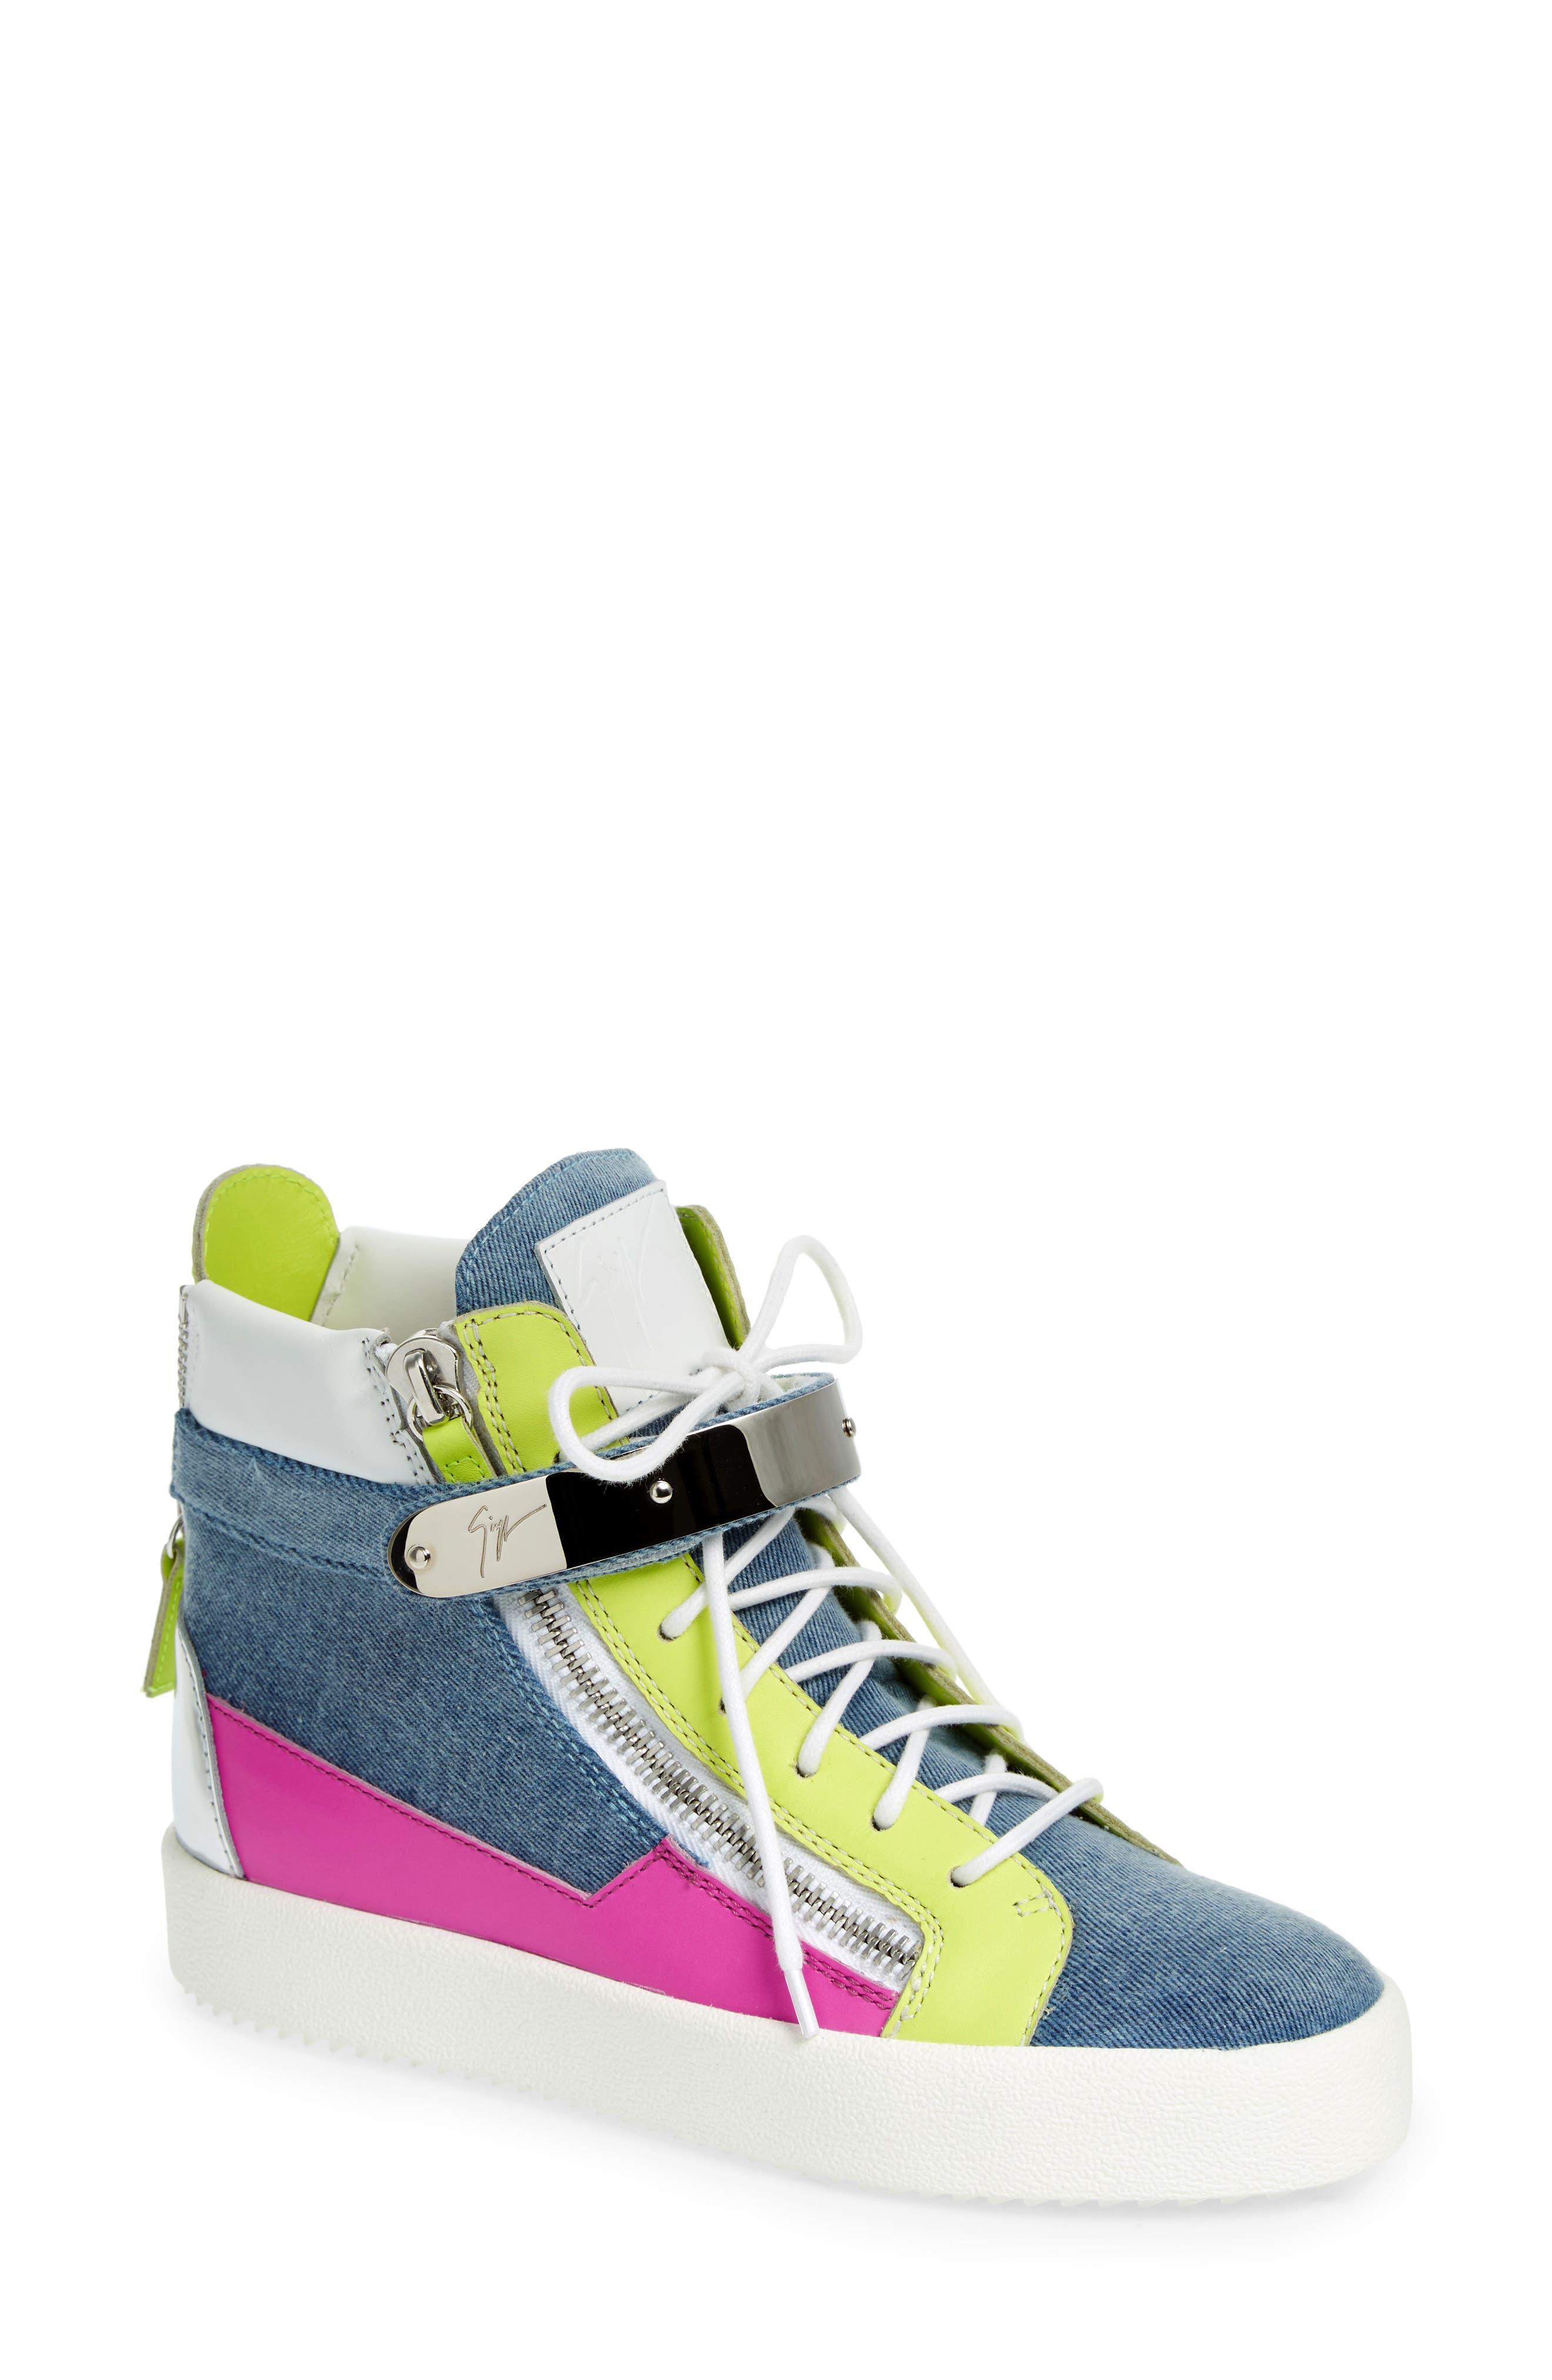 May London High Top Sneaker,                             Main thumbnail 1, color,                             400